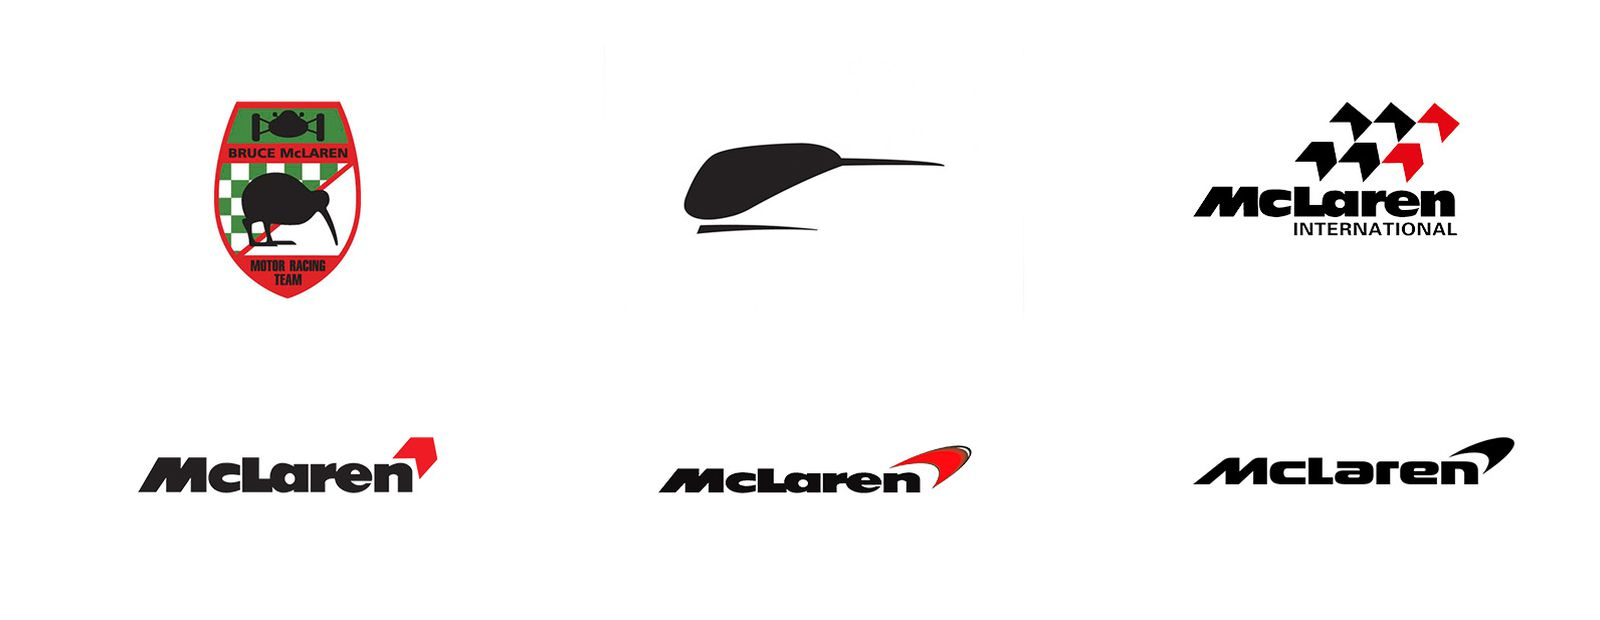 Logos historiques de McLaren